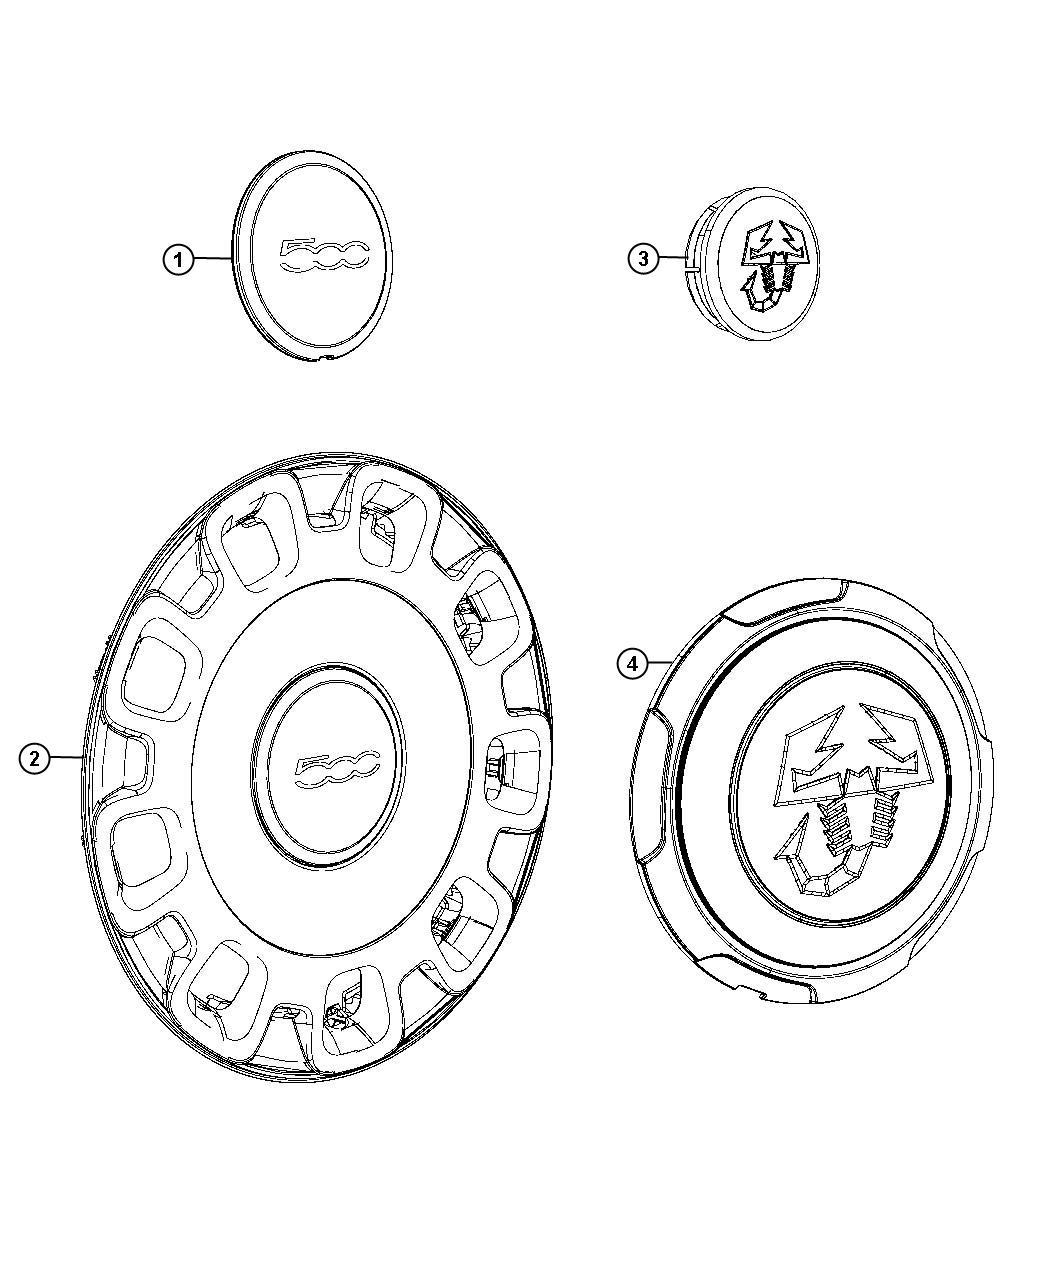 2013 Fiat 500C Cover. Wheel. [15 wheel covers